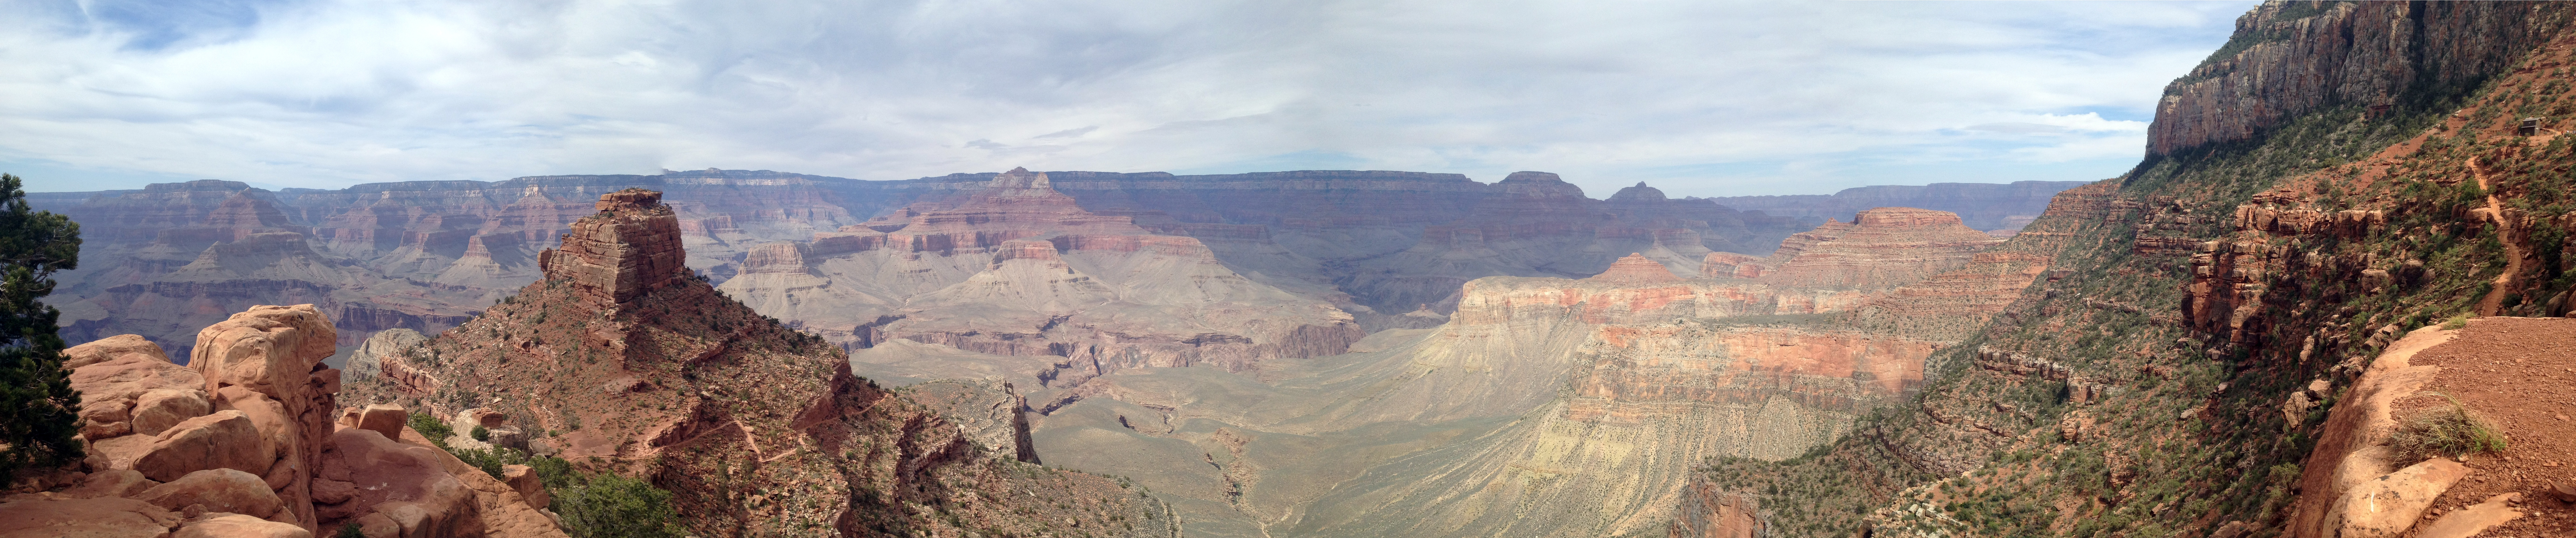 File Cedar Ridge Grand Canyon Jpg Wikimedia Commons